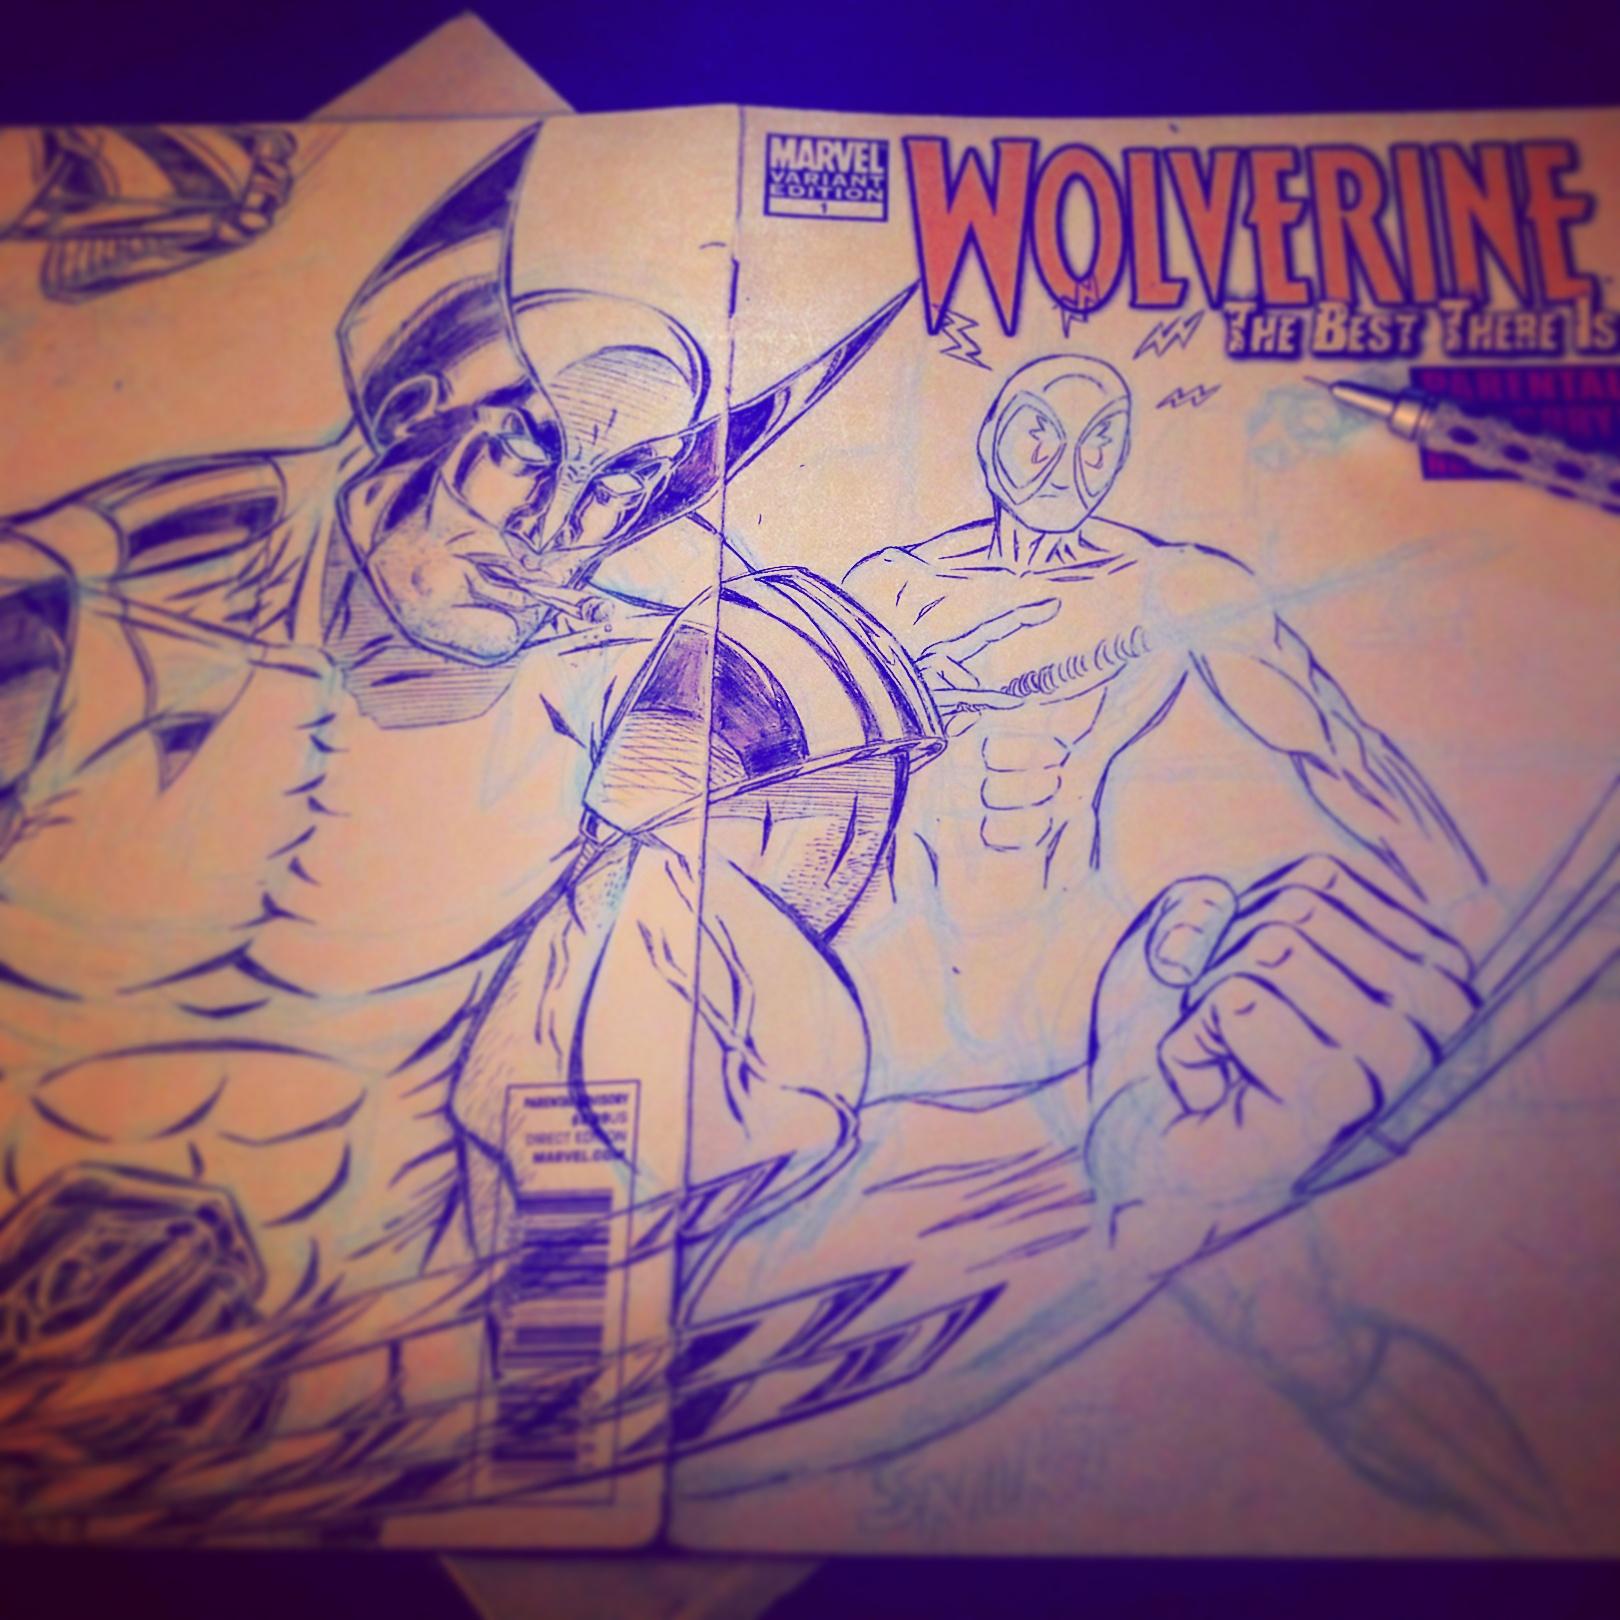 Wolverine Sketch Cover (sketch)